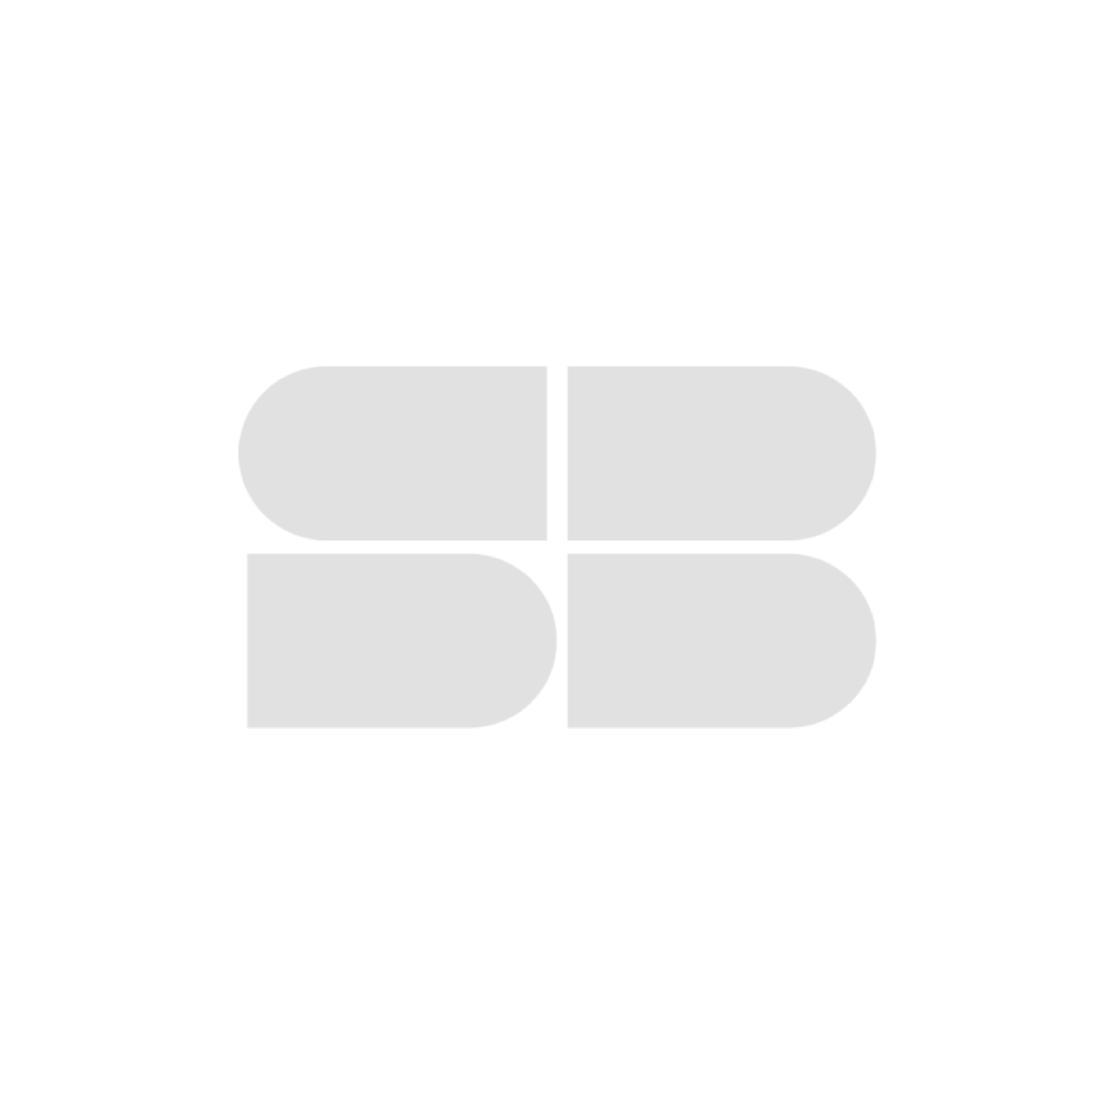 19184644-yakishi-furniture-sofa-recliner-corner-sofa-01